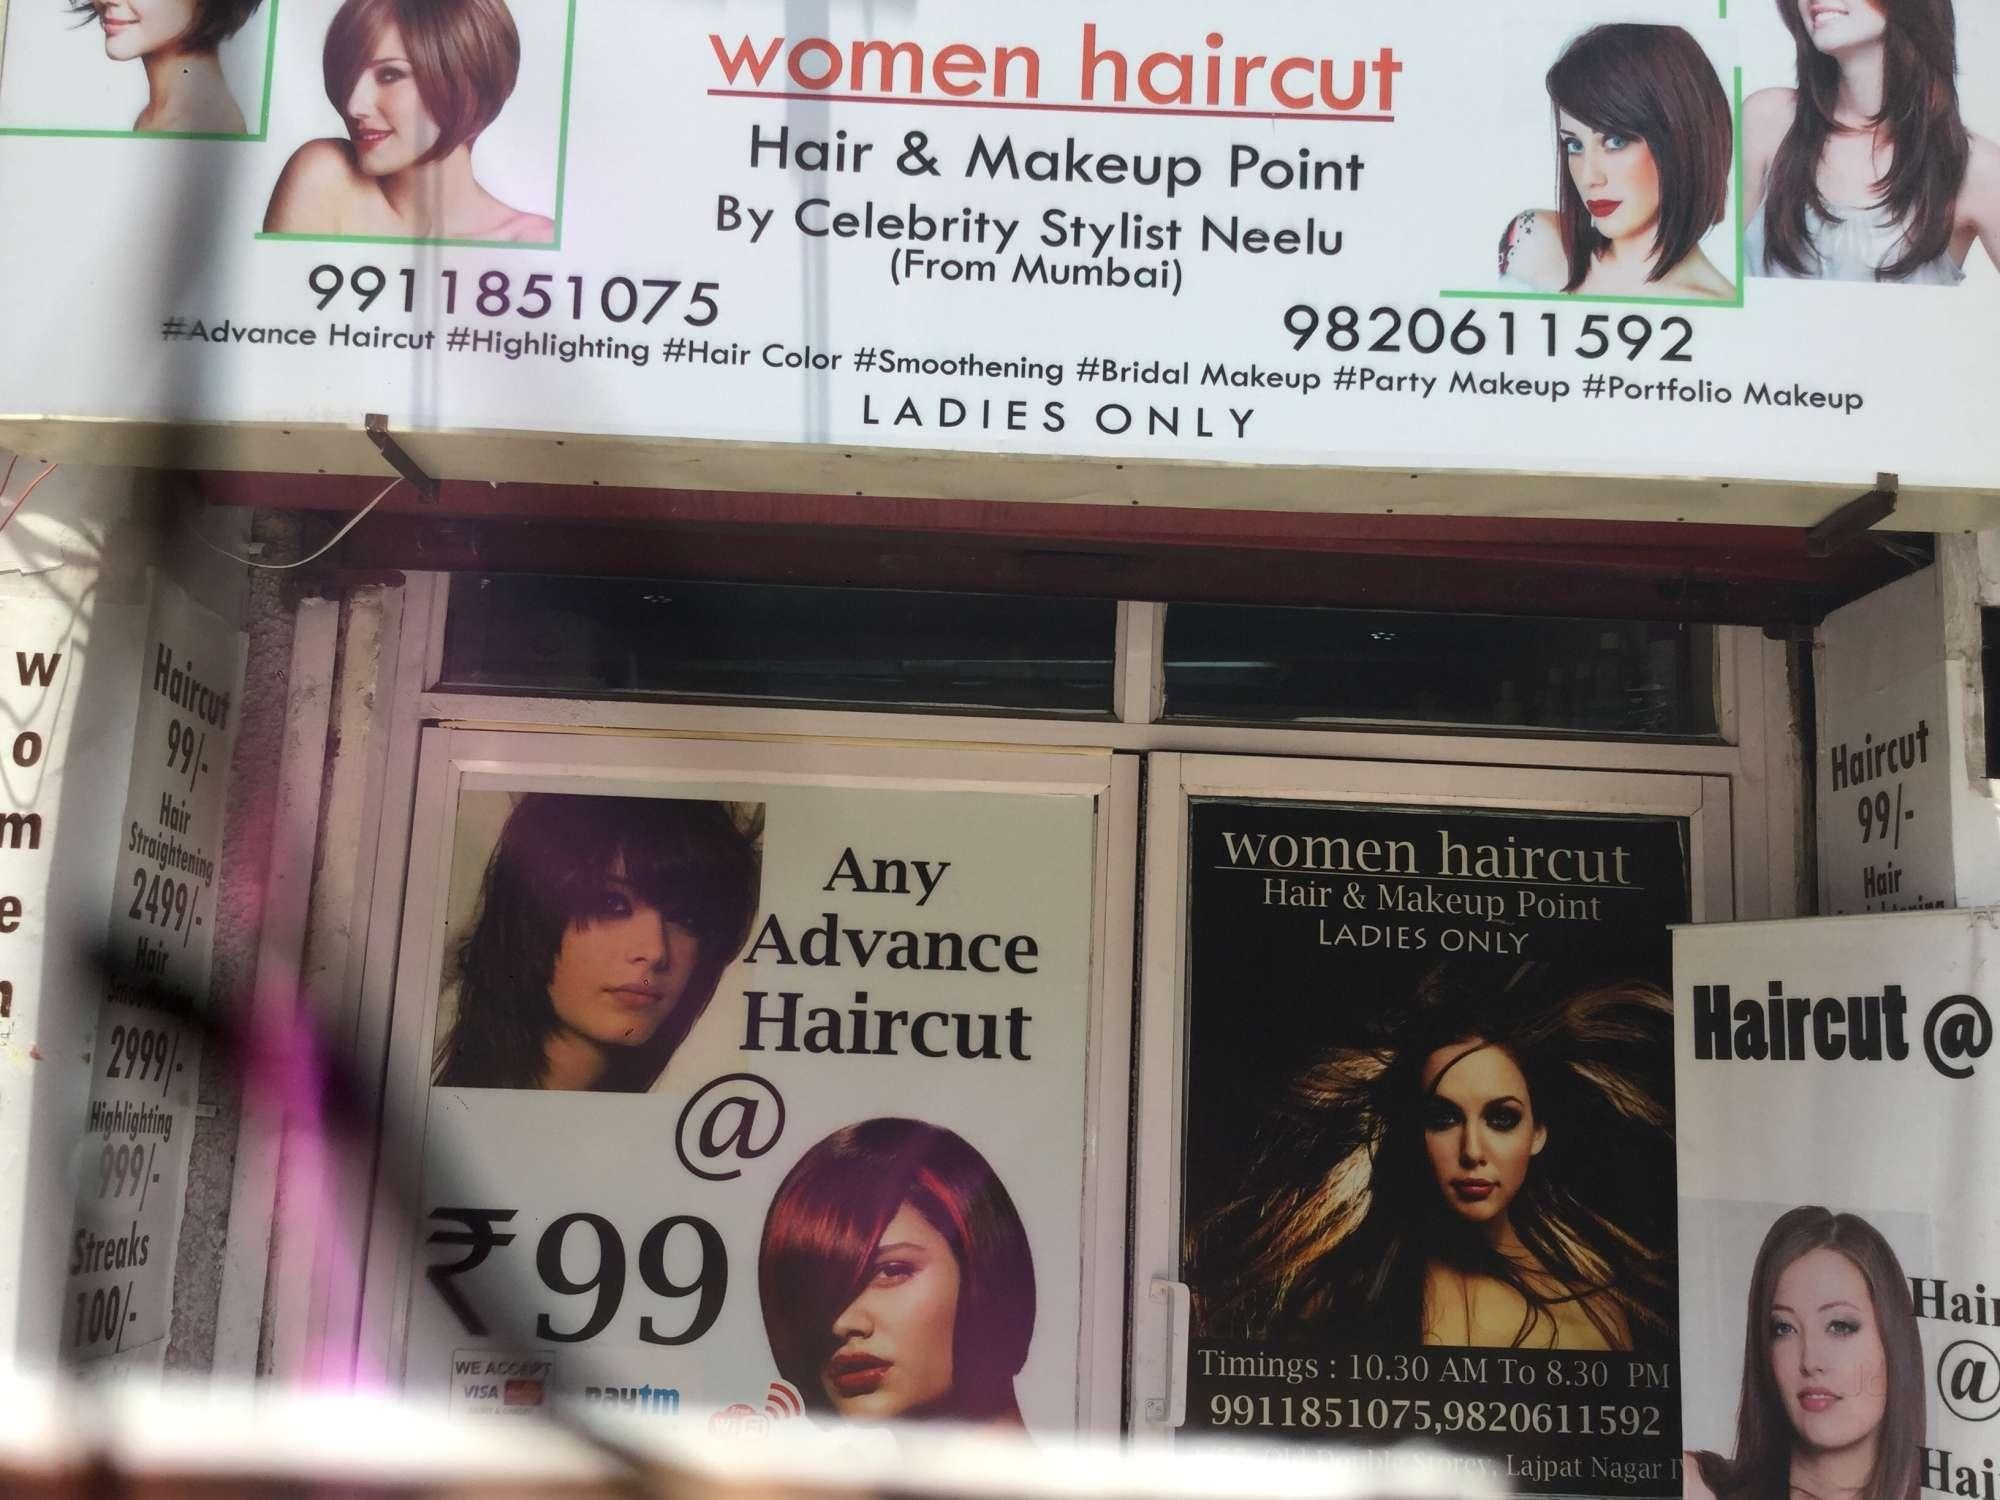 Women Haircut, Lajpat Nagar 4 - Beauty Parlours In Delhi - Justdial intended for Haircut Salon In Lajpat Nagar